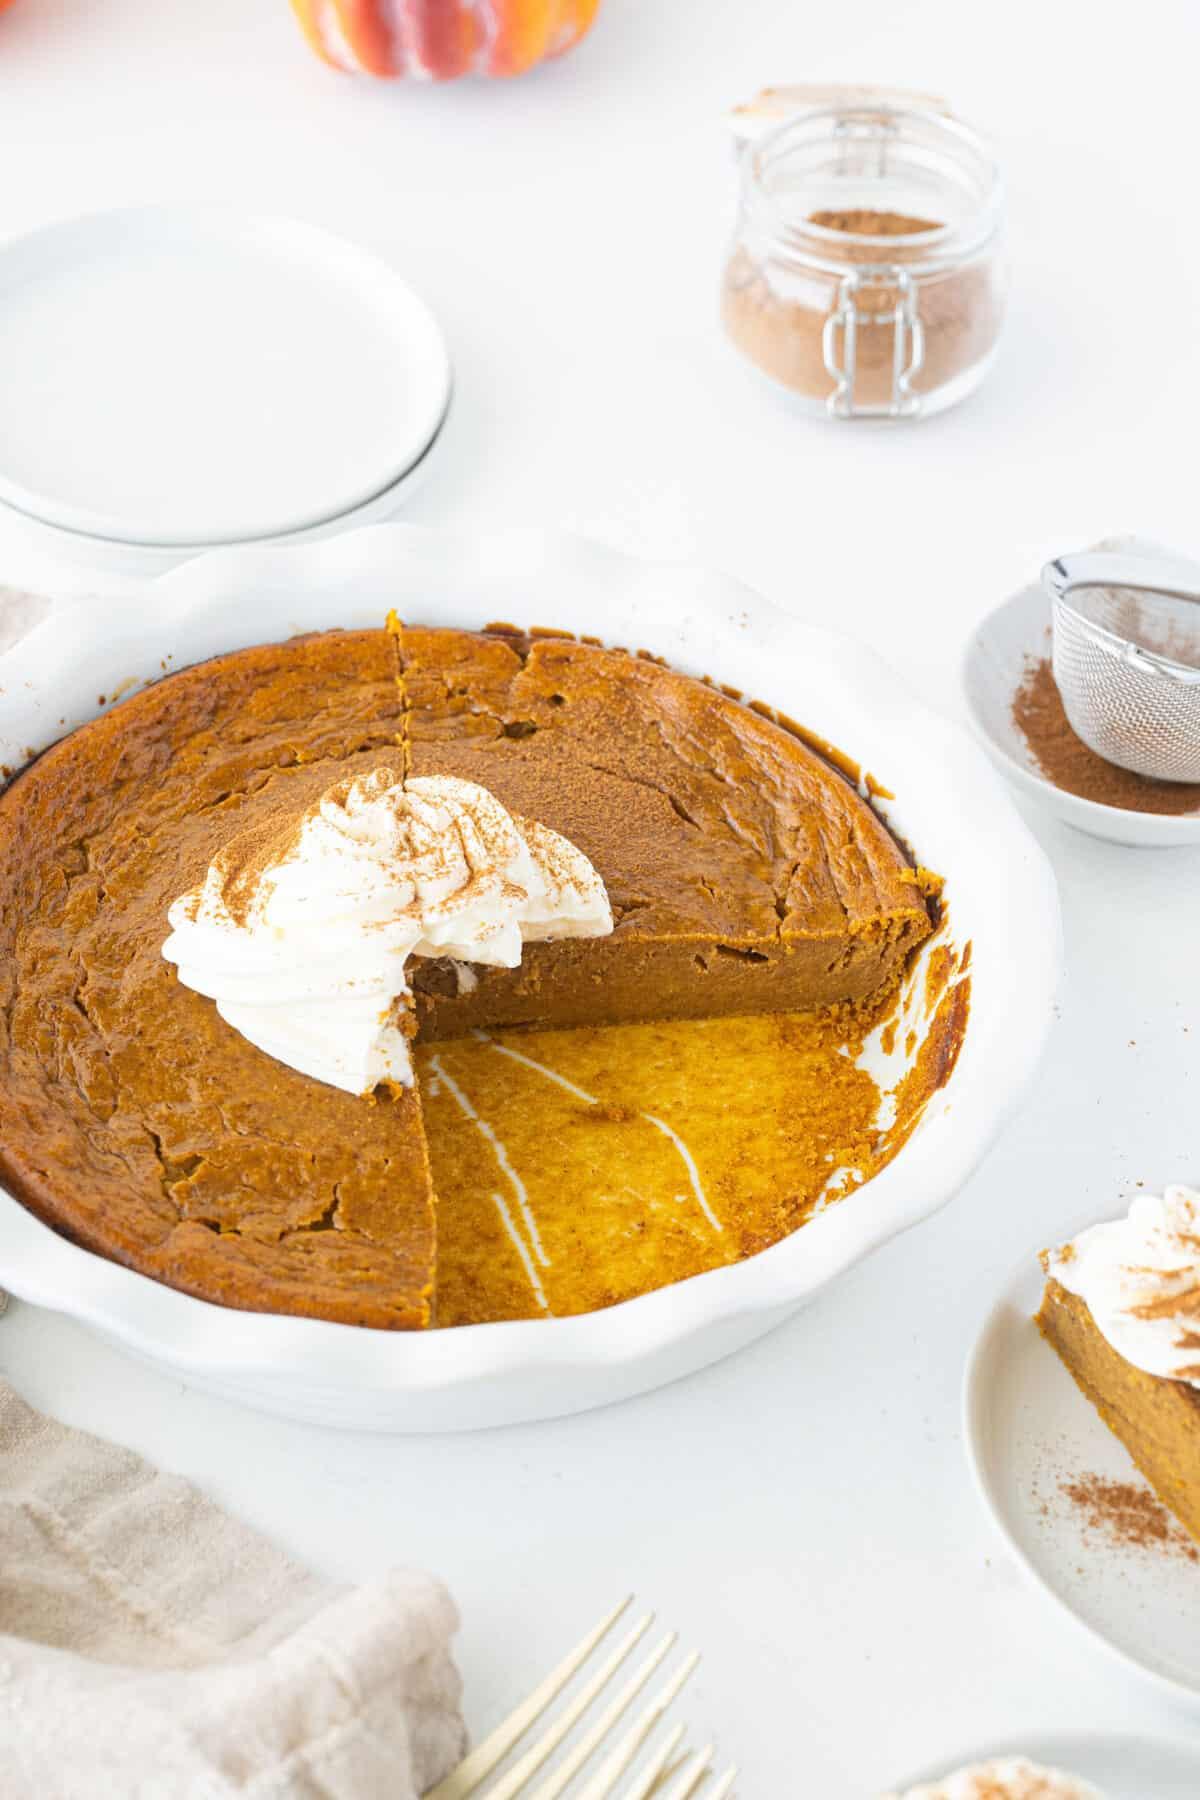 impossible pumpkin pie in a white pie plate